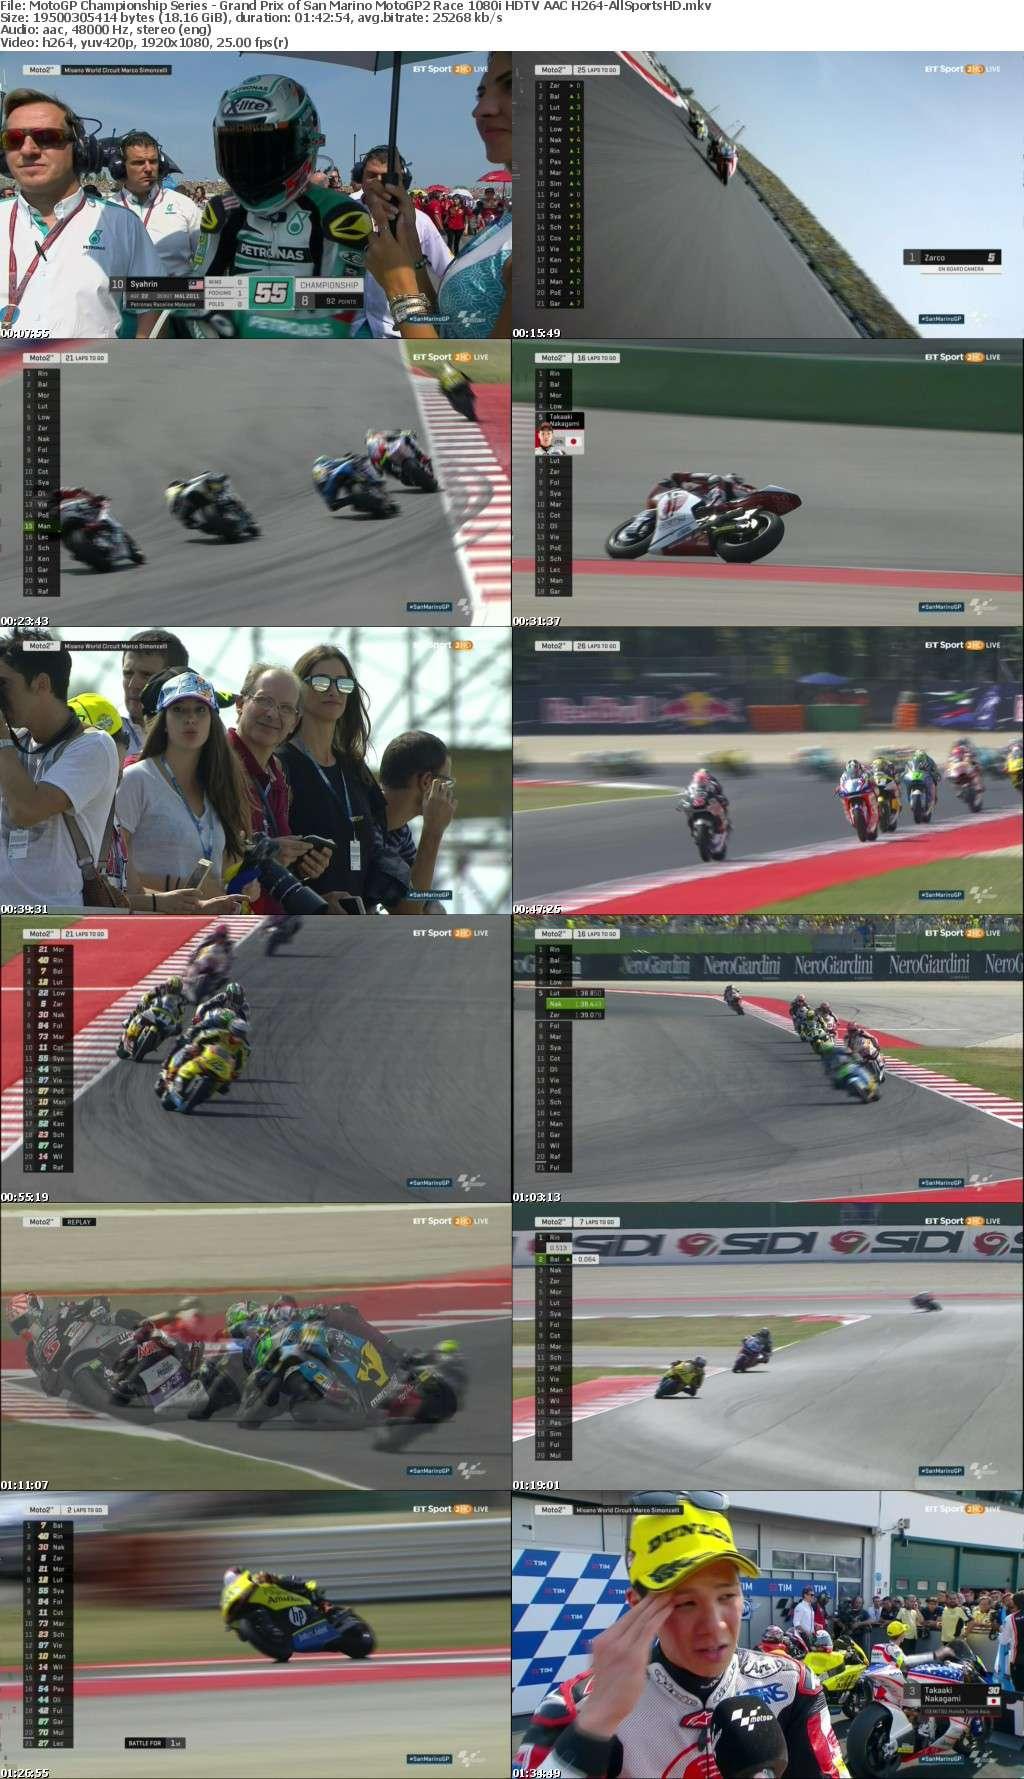 MotoGP Championship Series - Grand Prix of San Marino MotoGP2 Race 1080i HDTV AAC H264-AllSportsHD